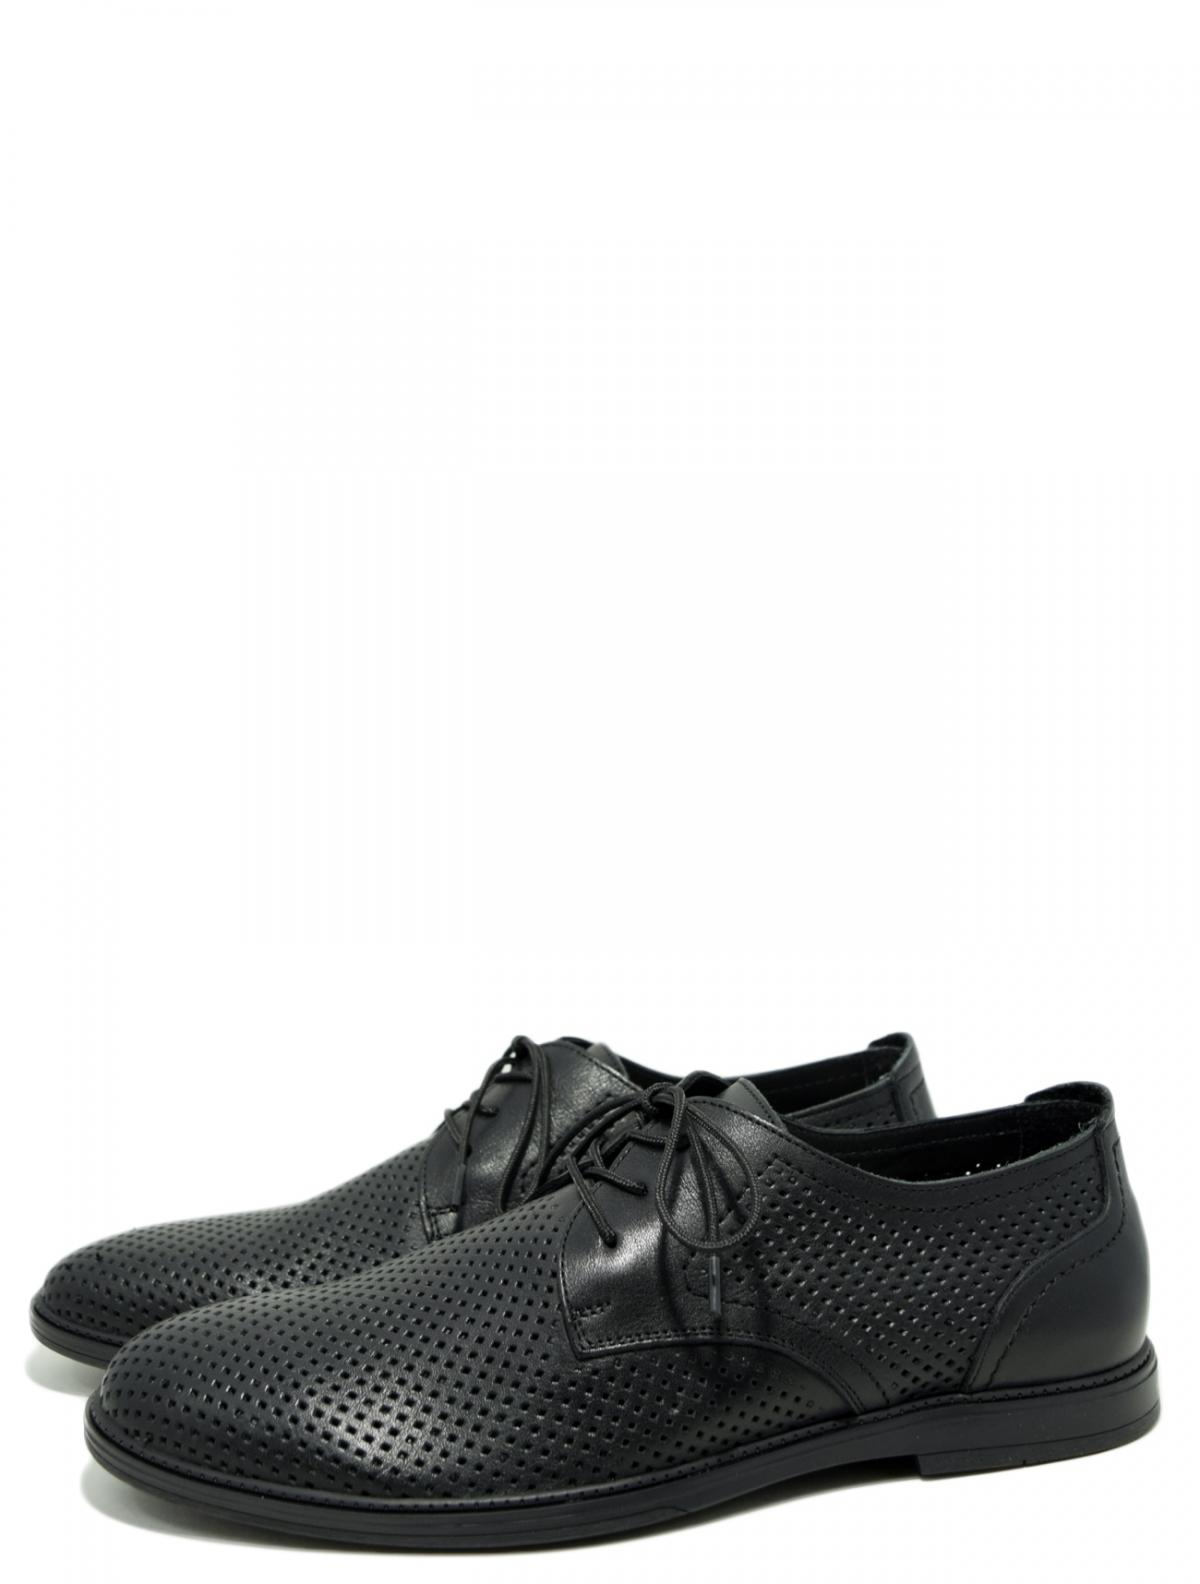 Rooman 905-193-L1L мужские туфли